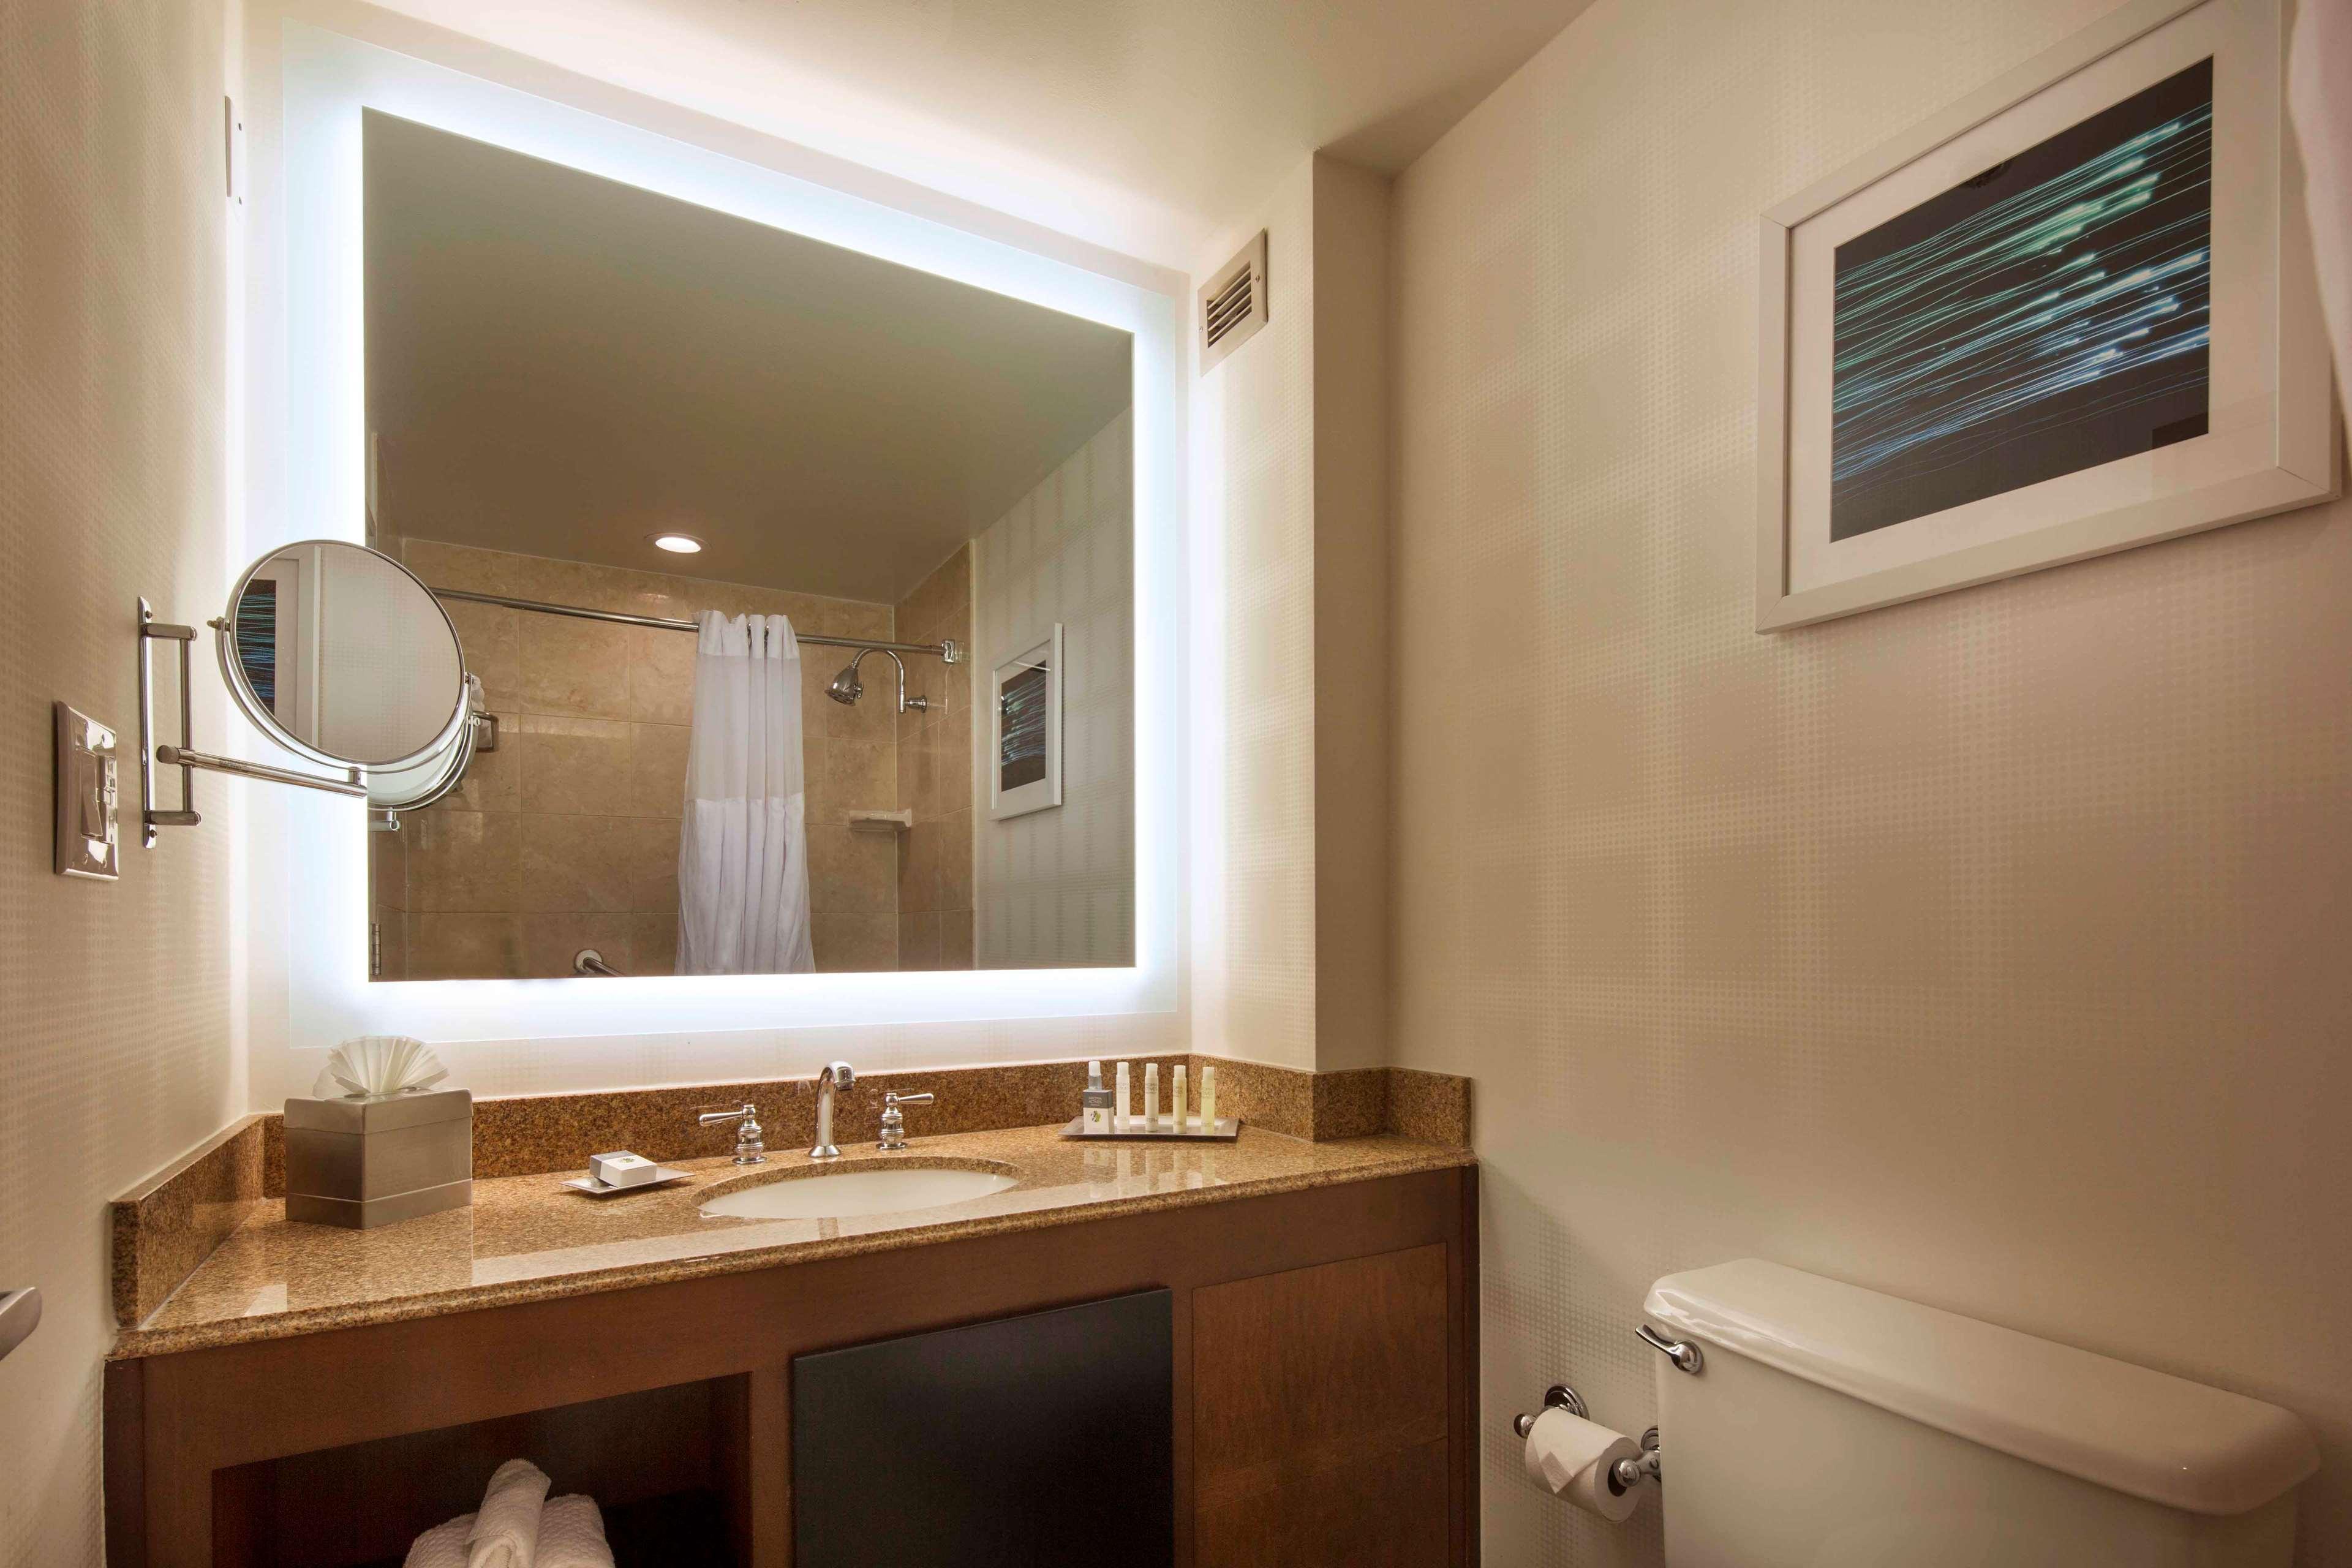 DoubleTree by Hilton Hotel Newark - Fremont image 25